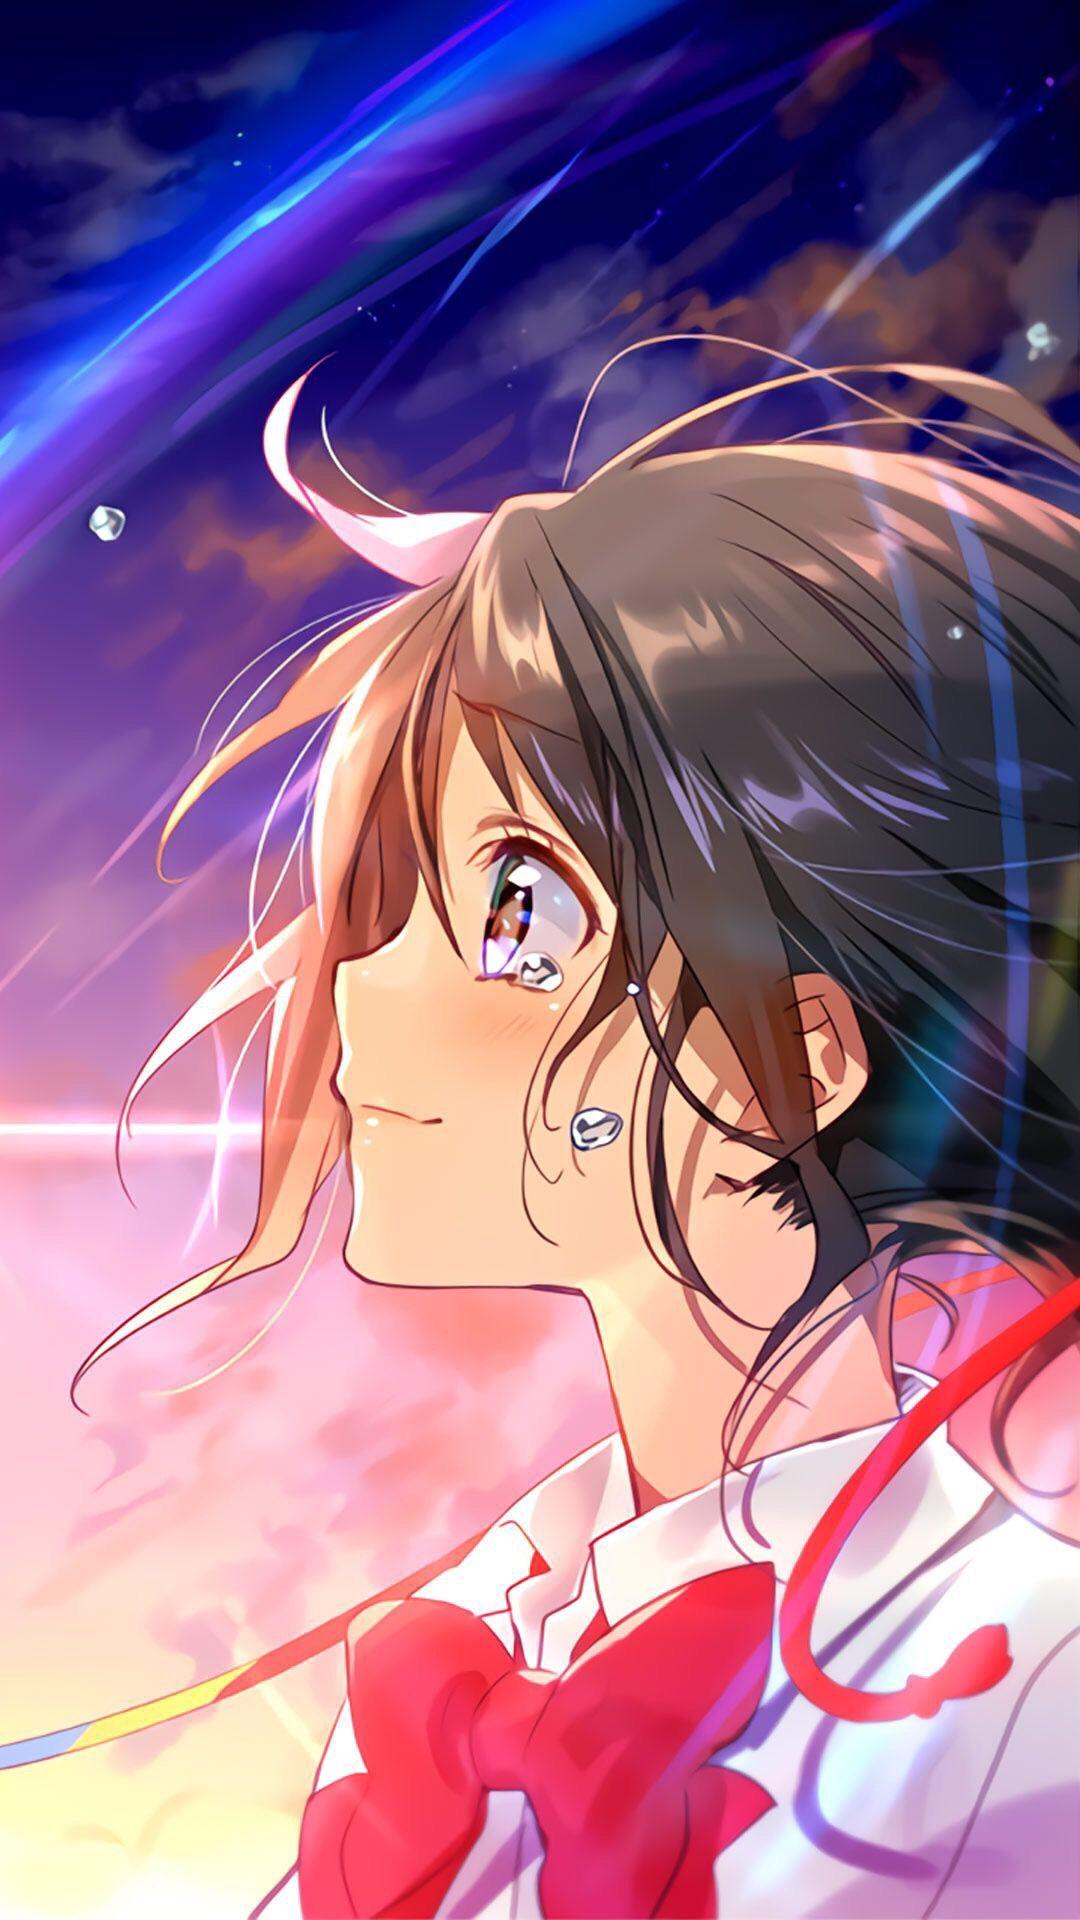 1001 Gambar Kartun Pp Couple Terpisah Anime | Cikimm.com